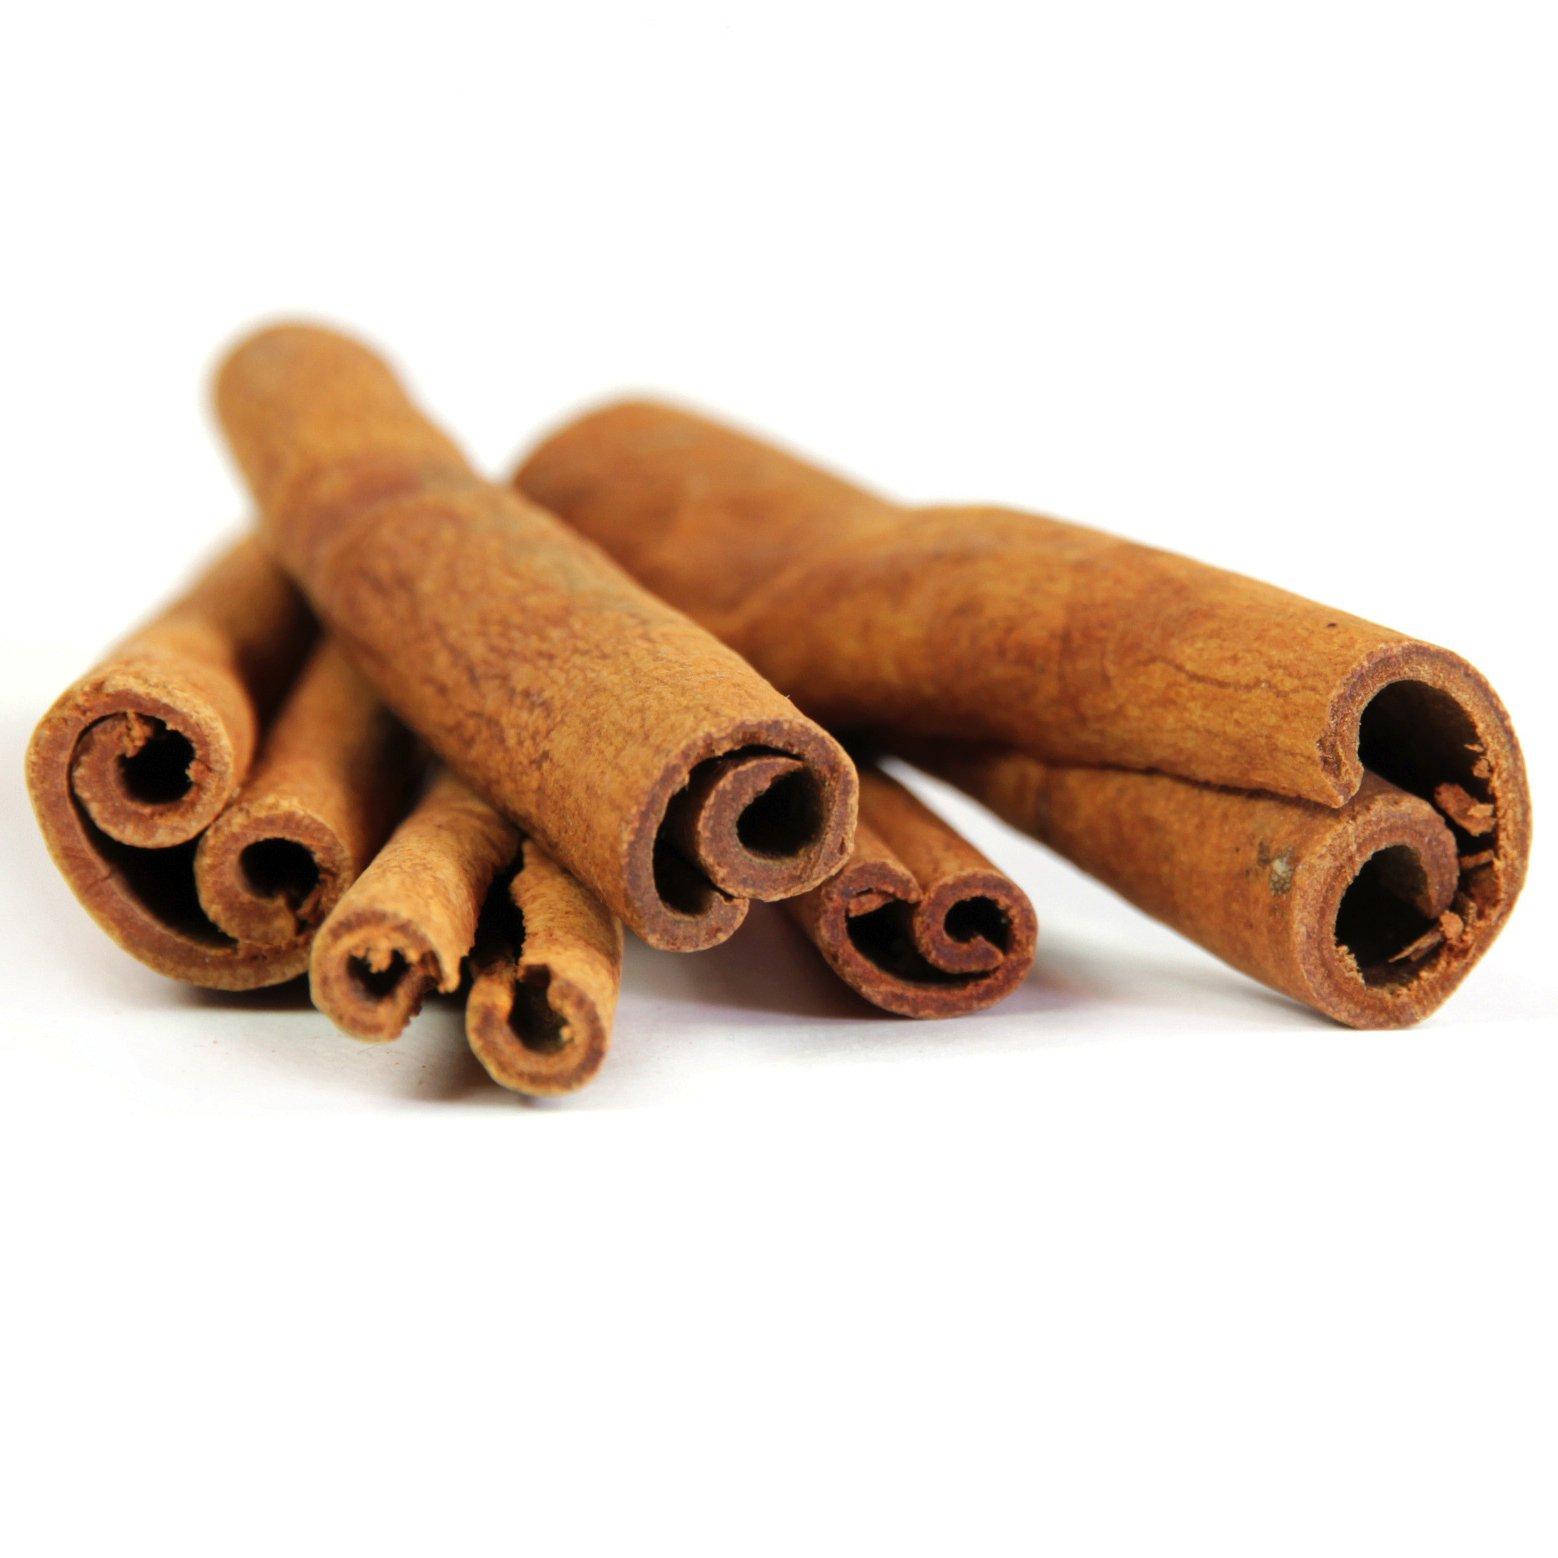 Cinnamon Sticks - Vietnamese - Red Stick Spice Company